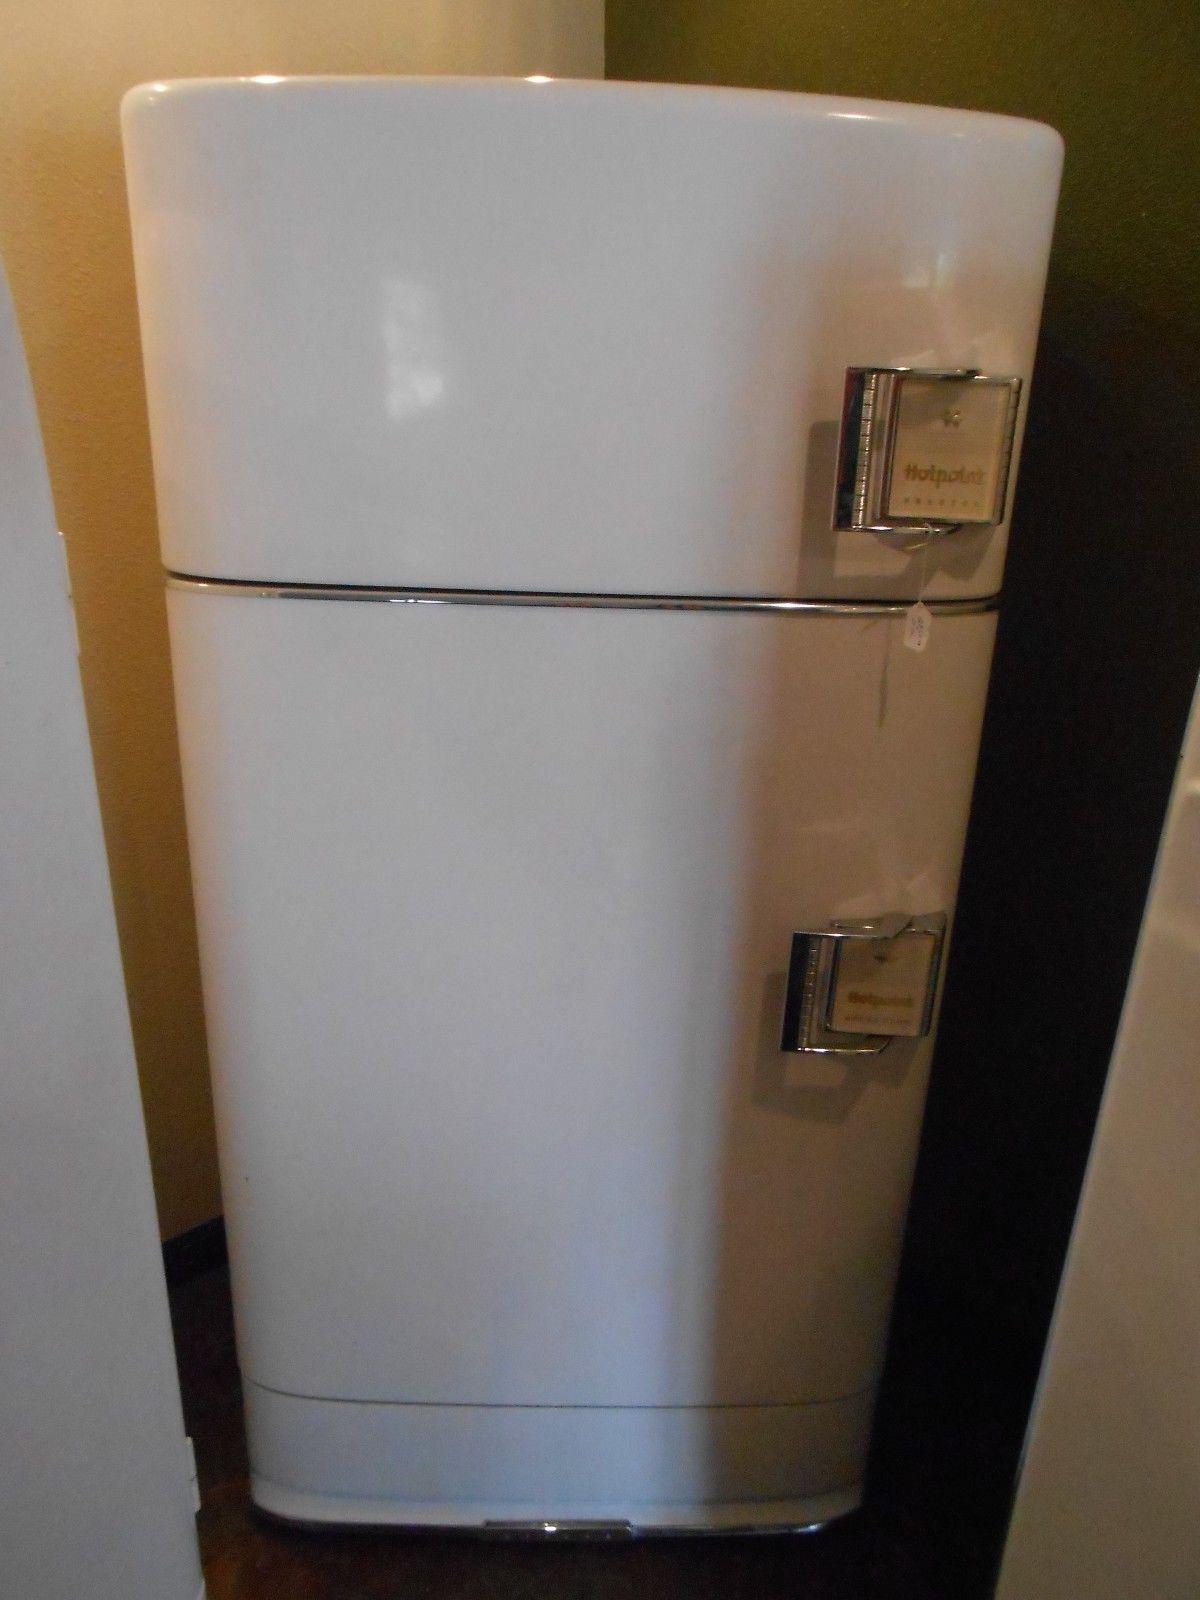 Antique 2 Door Vintage Hotpoint Refrigerator Top Freezer Buckle Handles White Ebay Vintage Refrigerator Hotpoint Refrigerator Refrigerator